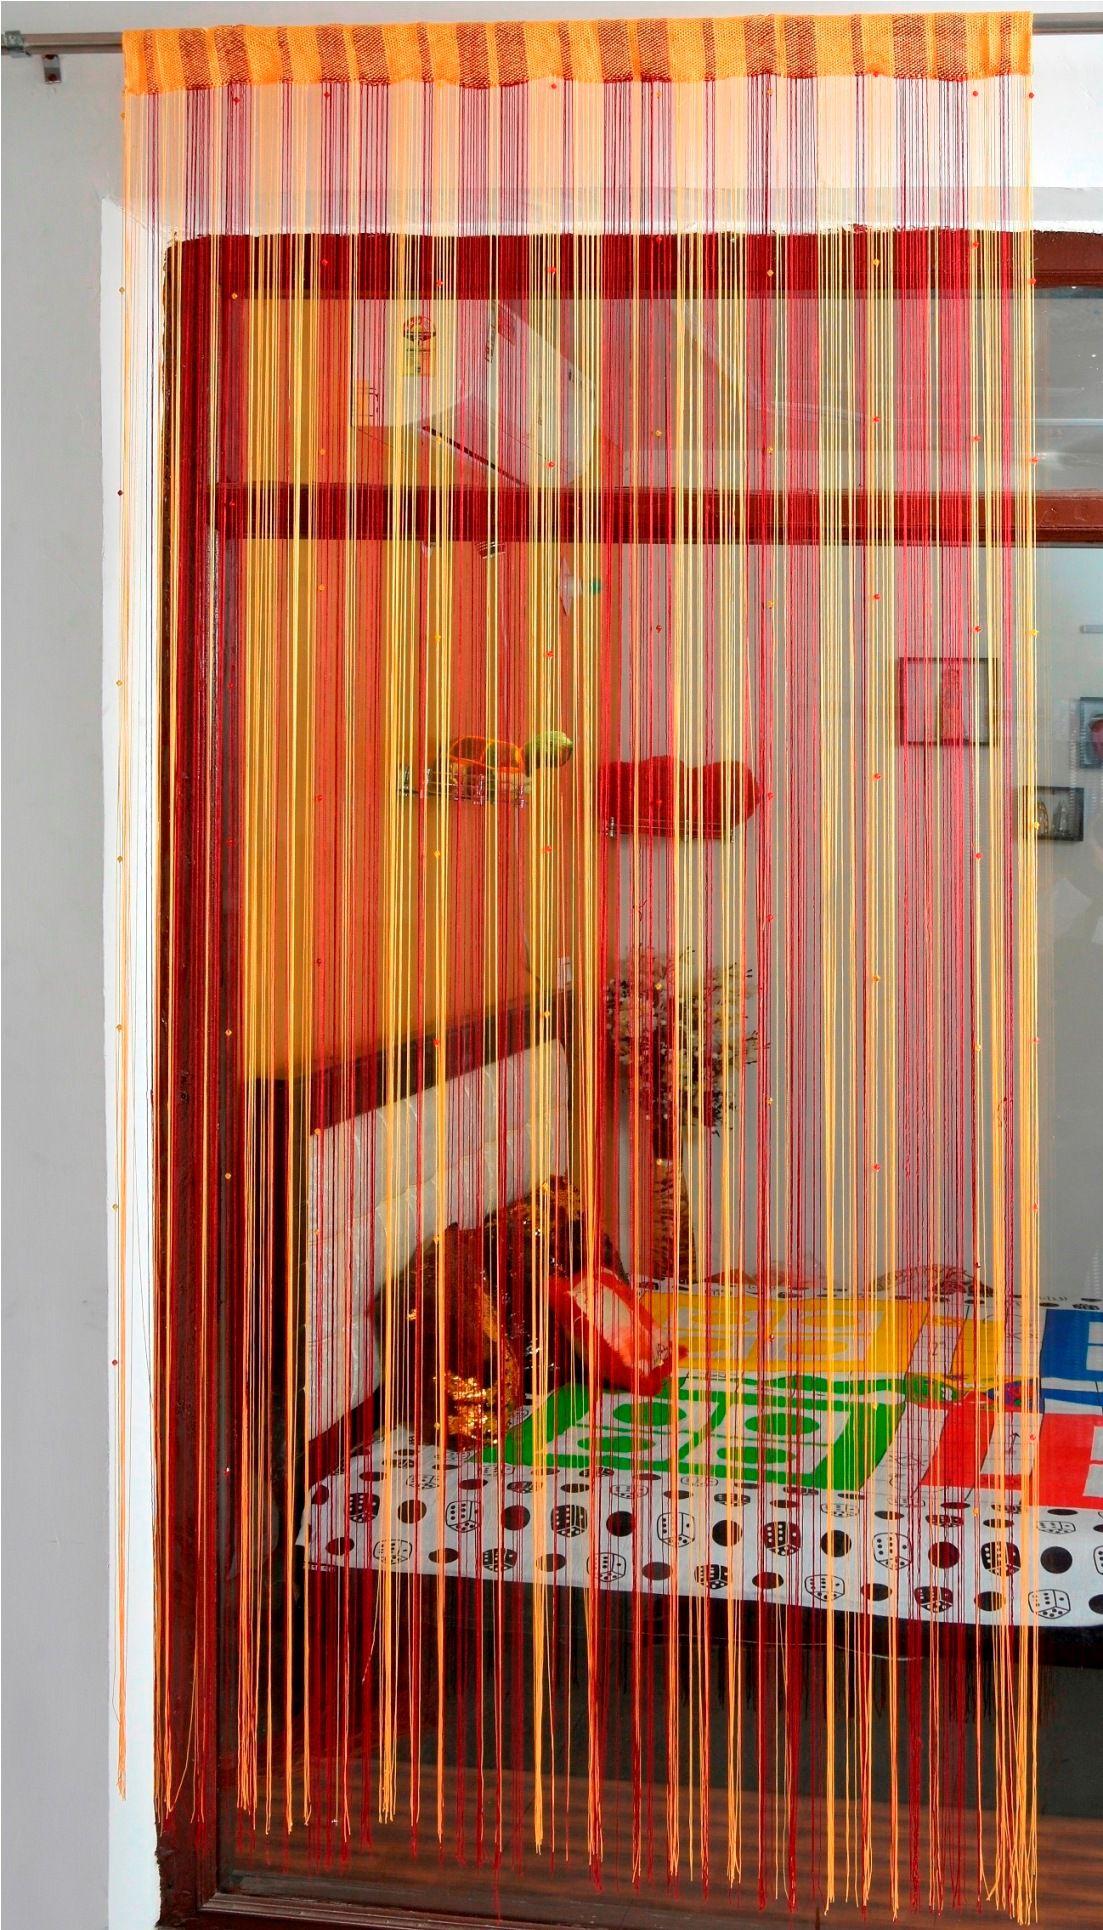 Ace International Exports Single Long Door Semi-Transparent Rod Pocket Polyester Curtains Maroon